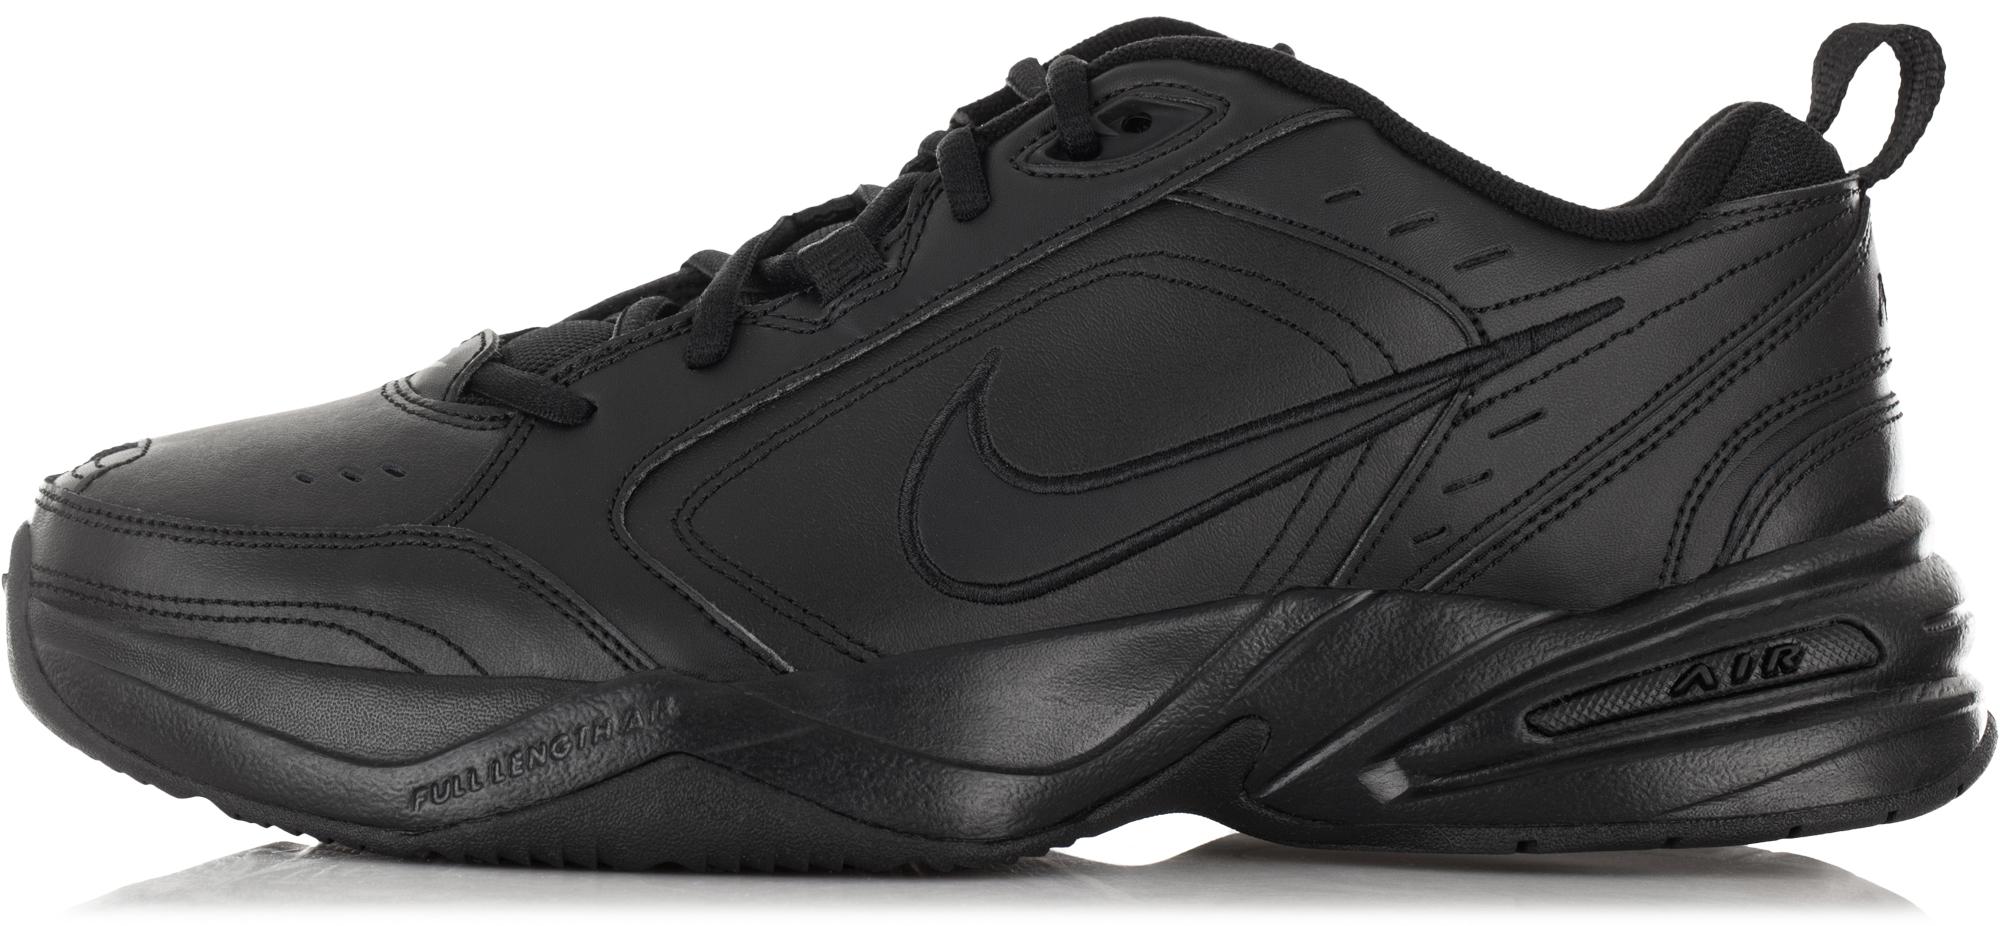 Nike Кроссовки мужские Nike Air Monarch IV, размер 47,5 недорго, оригинальная цена